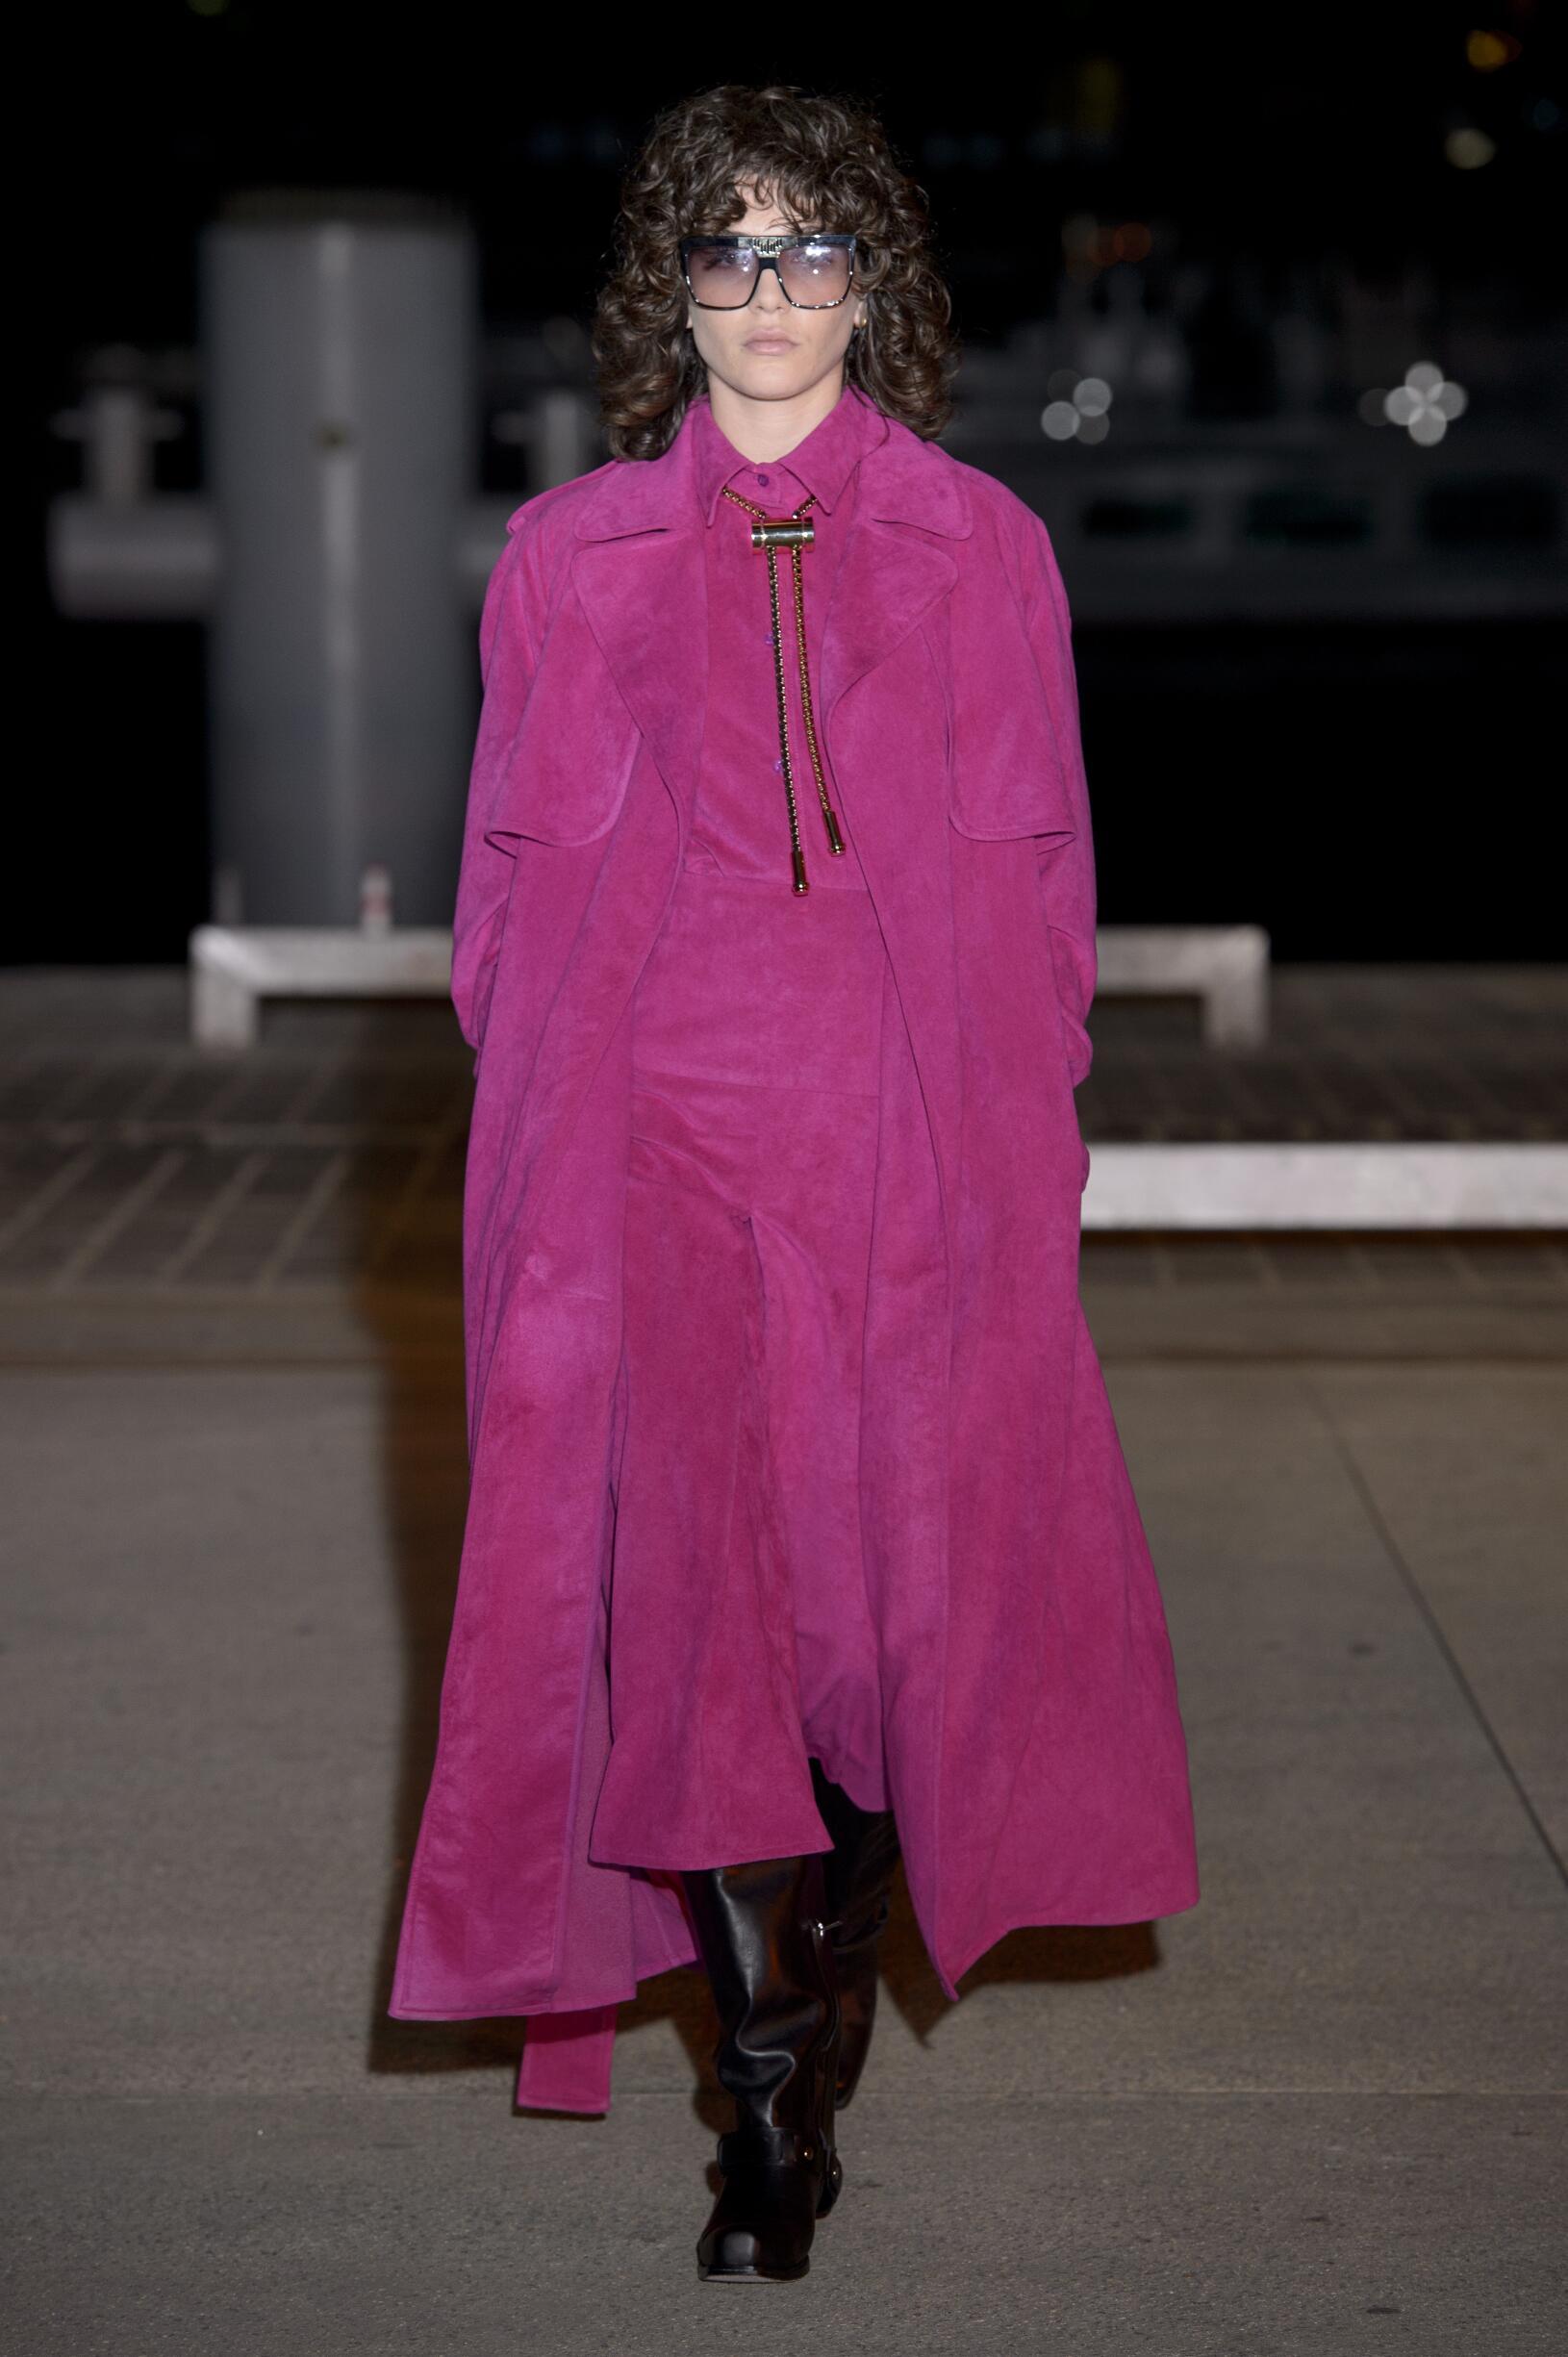 SS 2017 Fashion Show Wanda Nylon